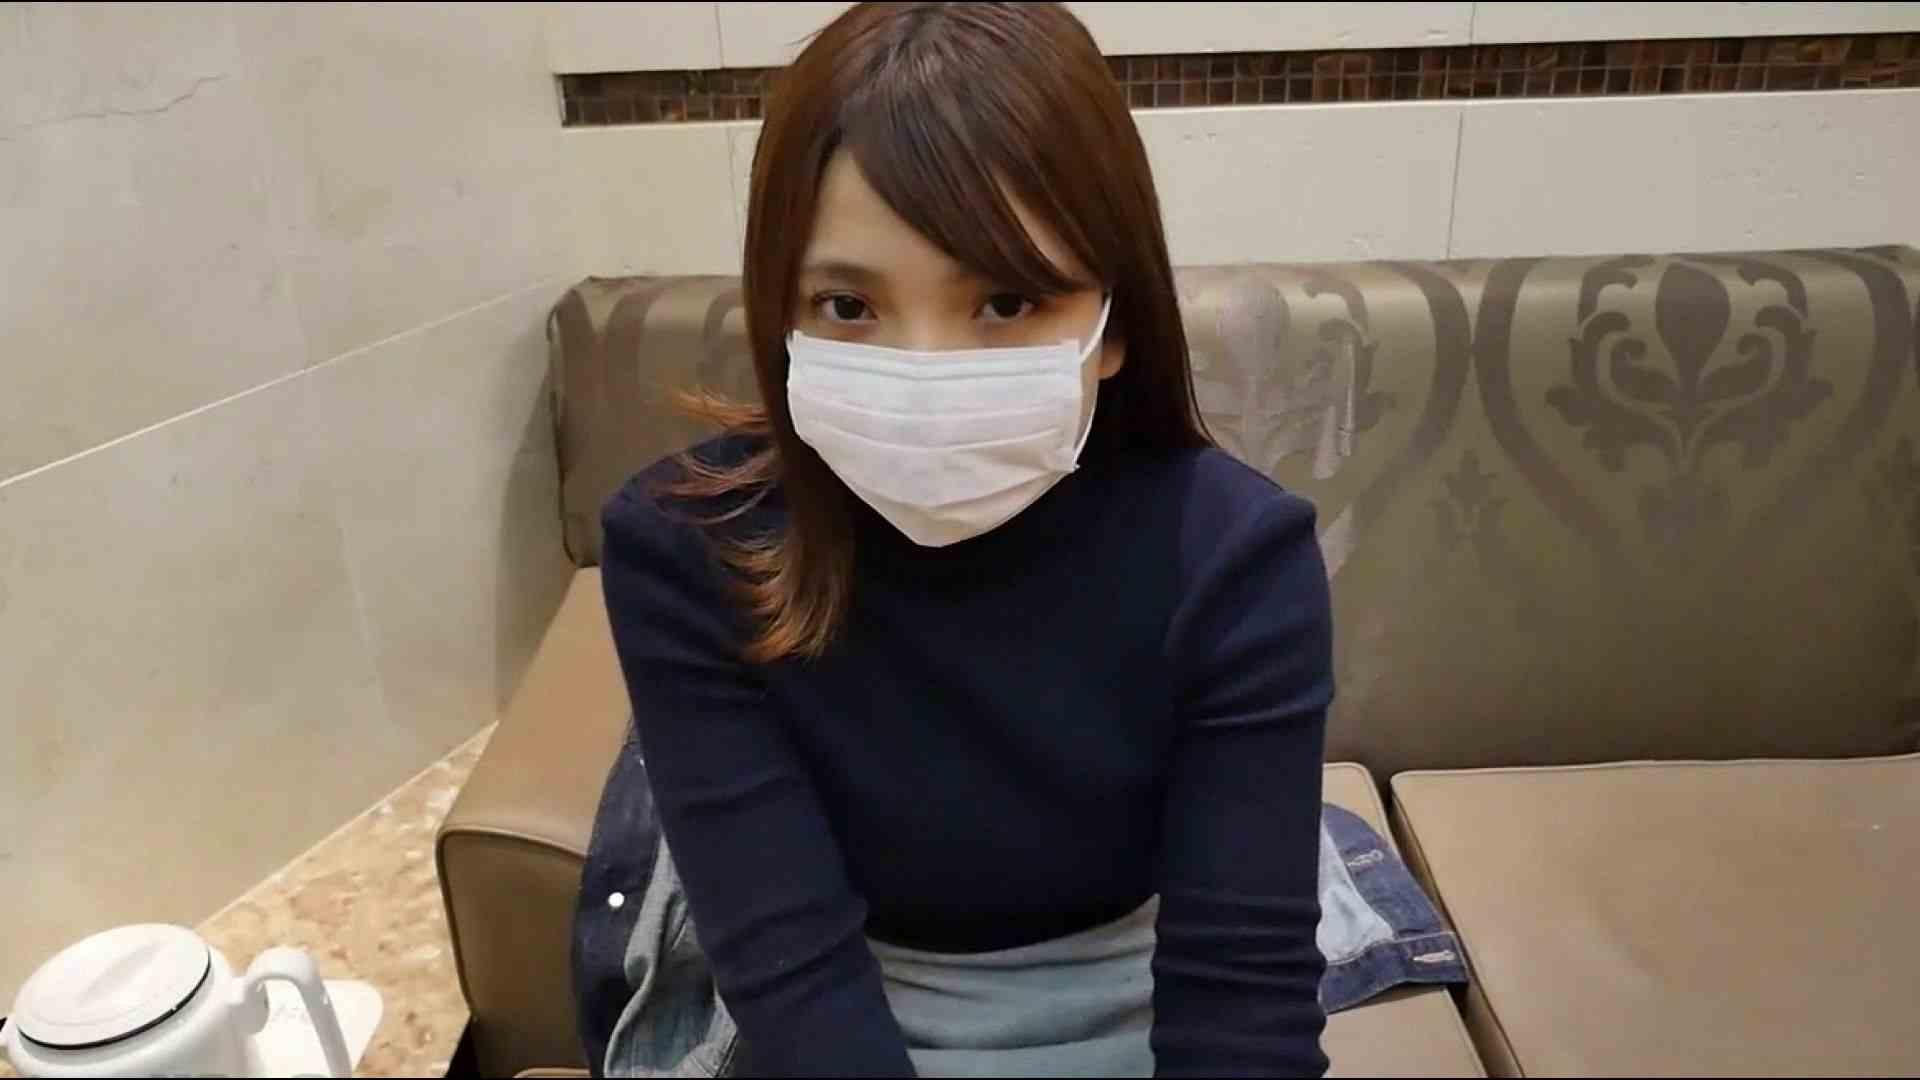 S級厳選美女ビッチガールVol.41 前編 OL女体  105連発 38